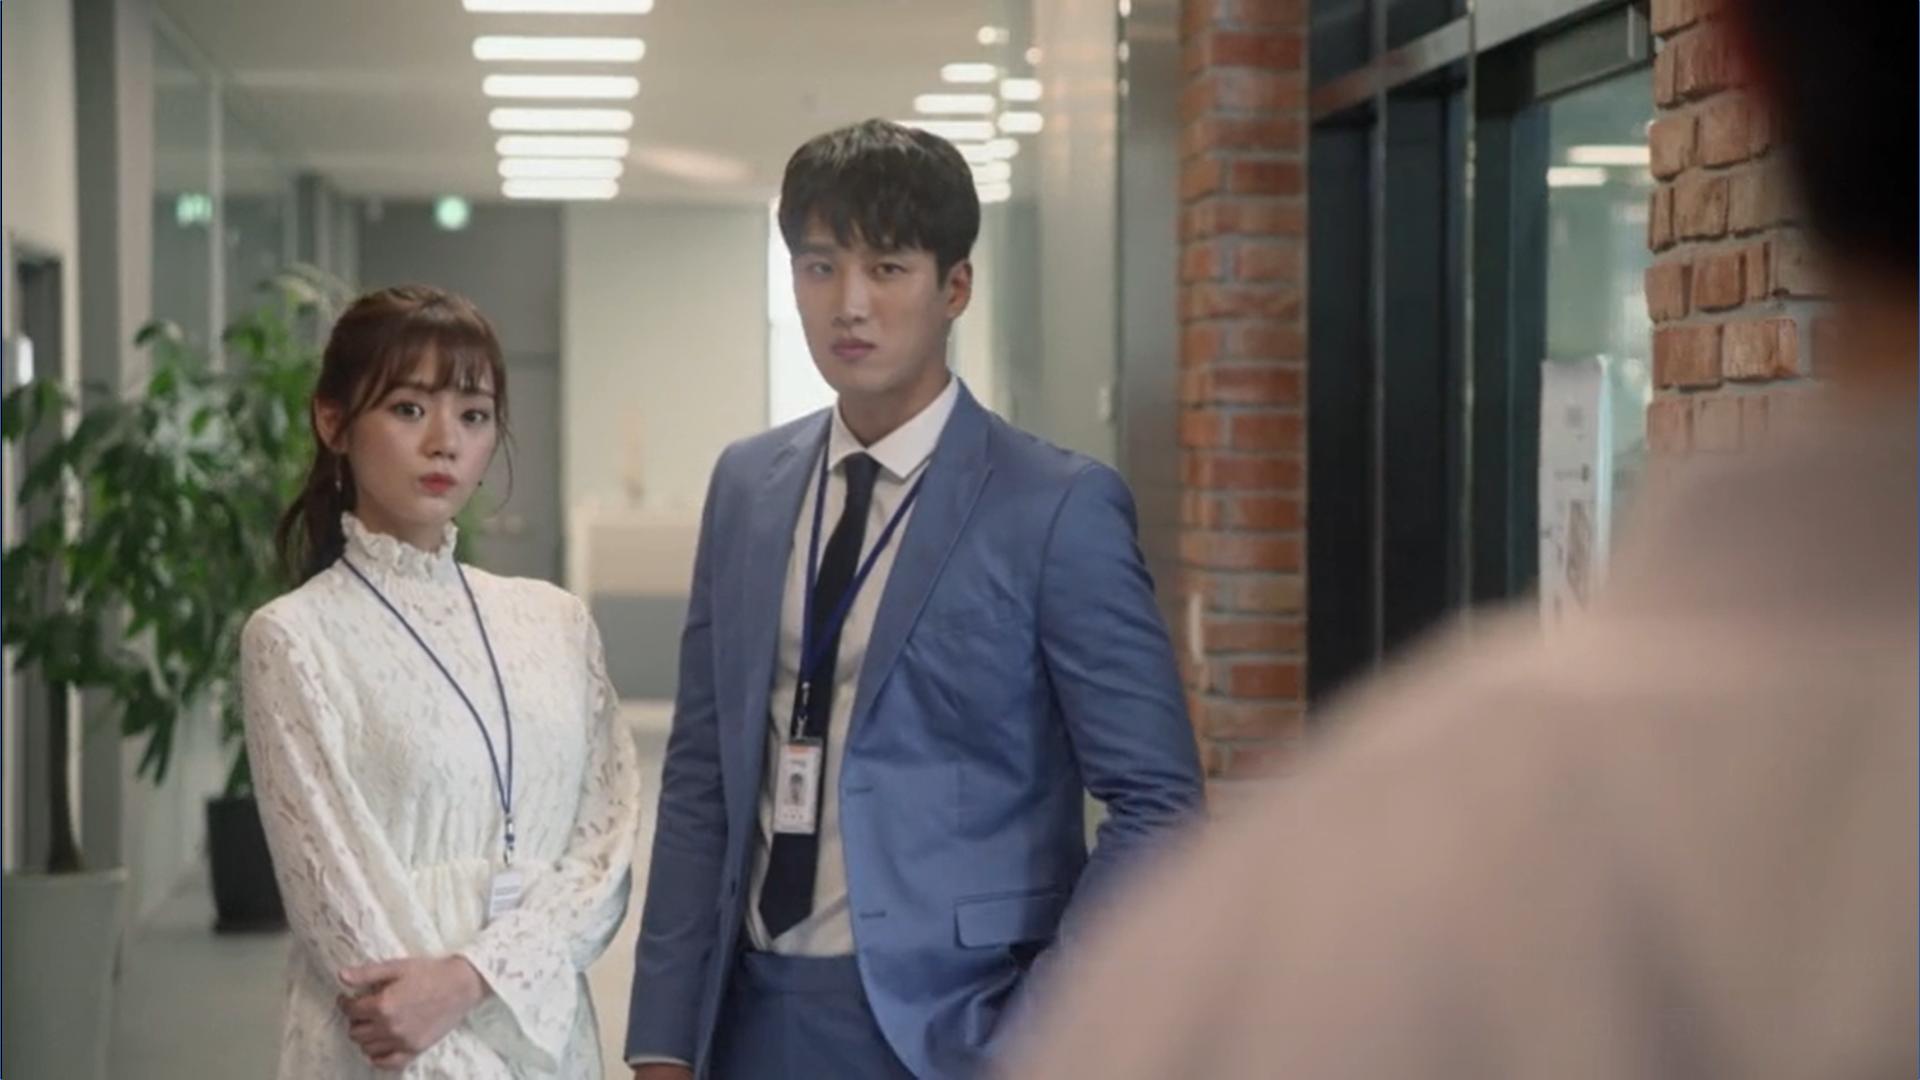 Wednesday 3:30 PM Baek Seung-gyu and girlfriend Kim Hye-won looking at Seon Eun-woo and Yoon Jae-won